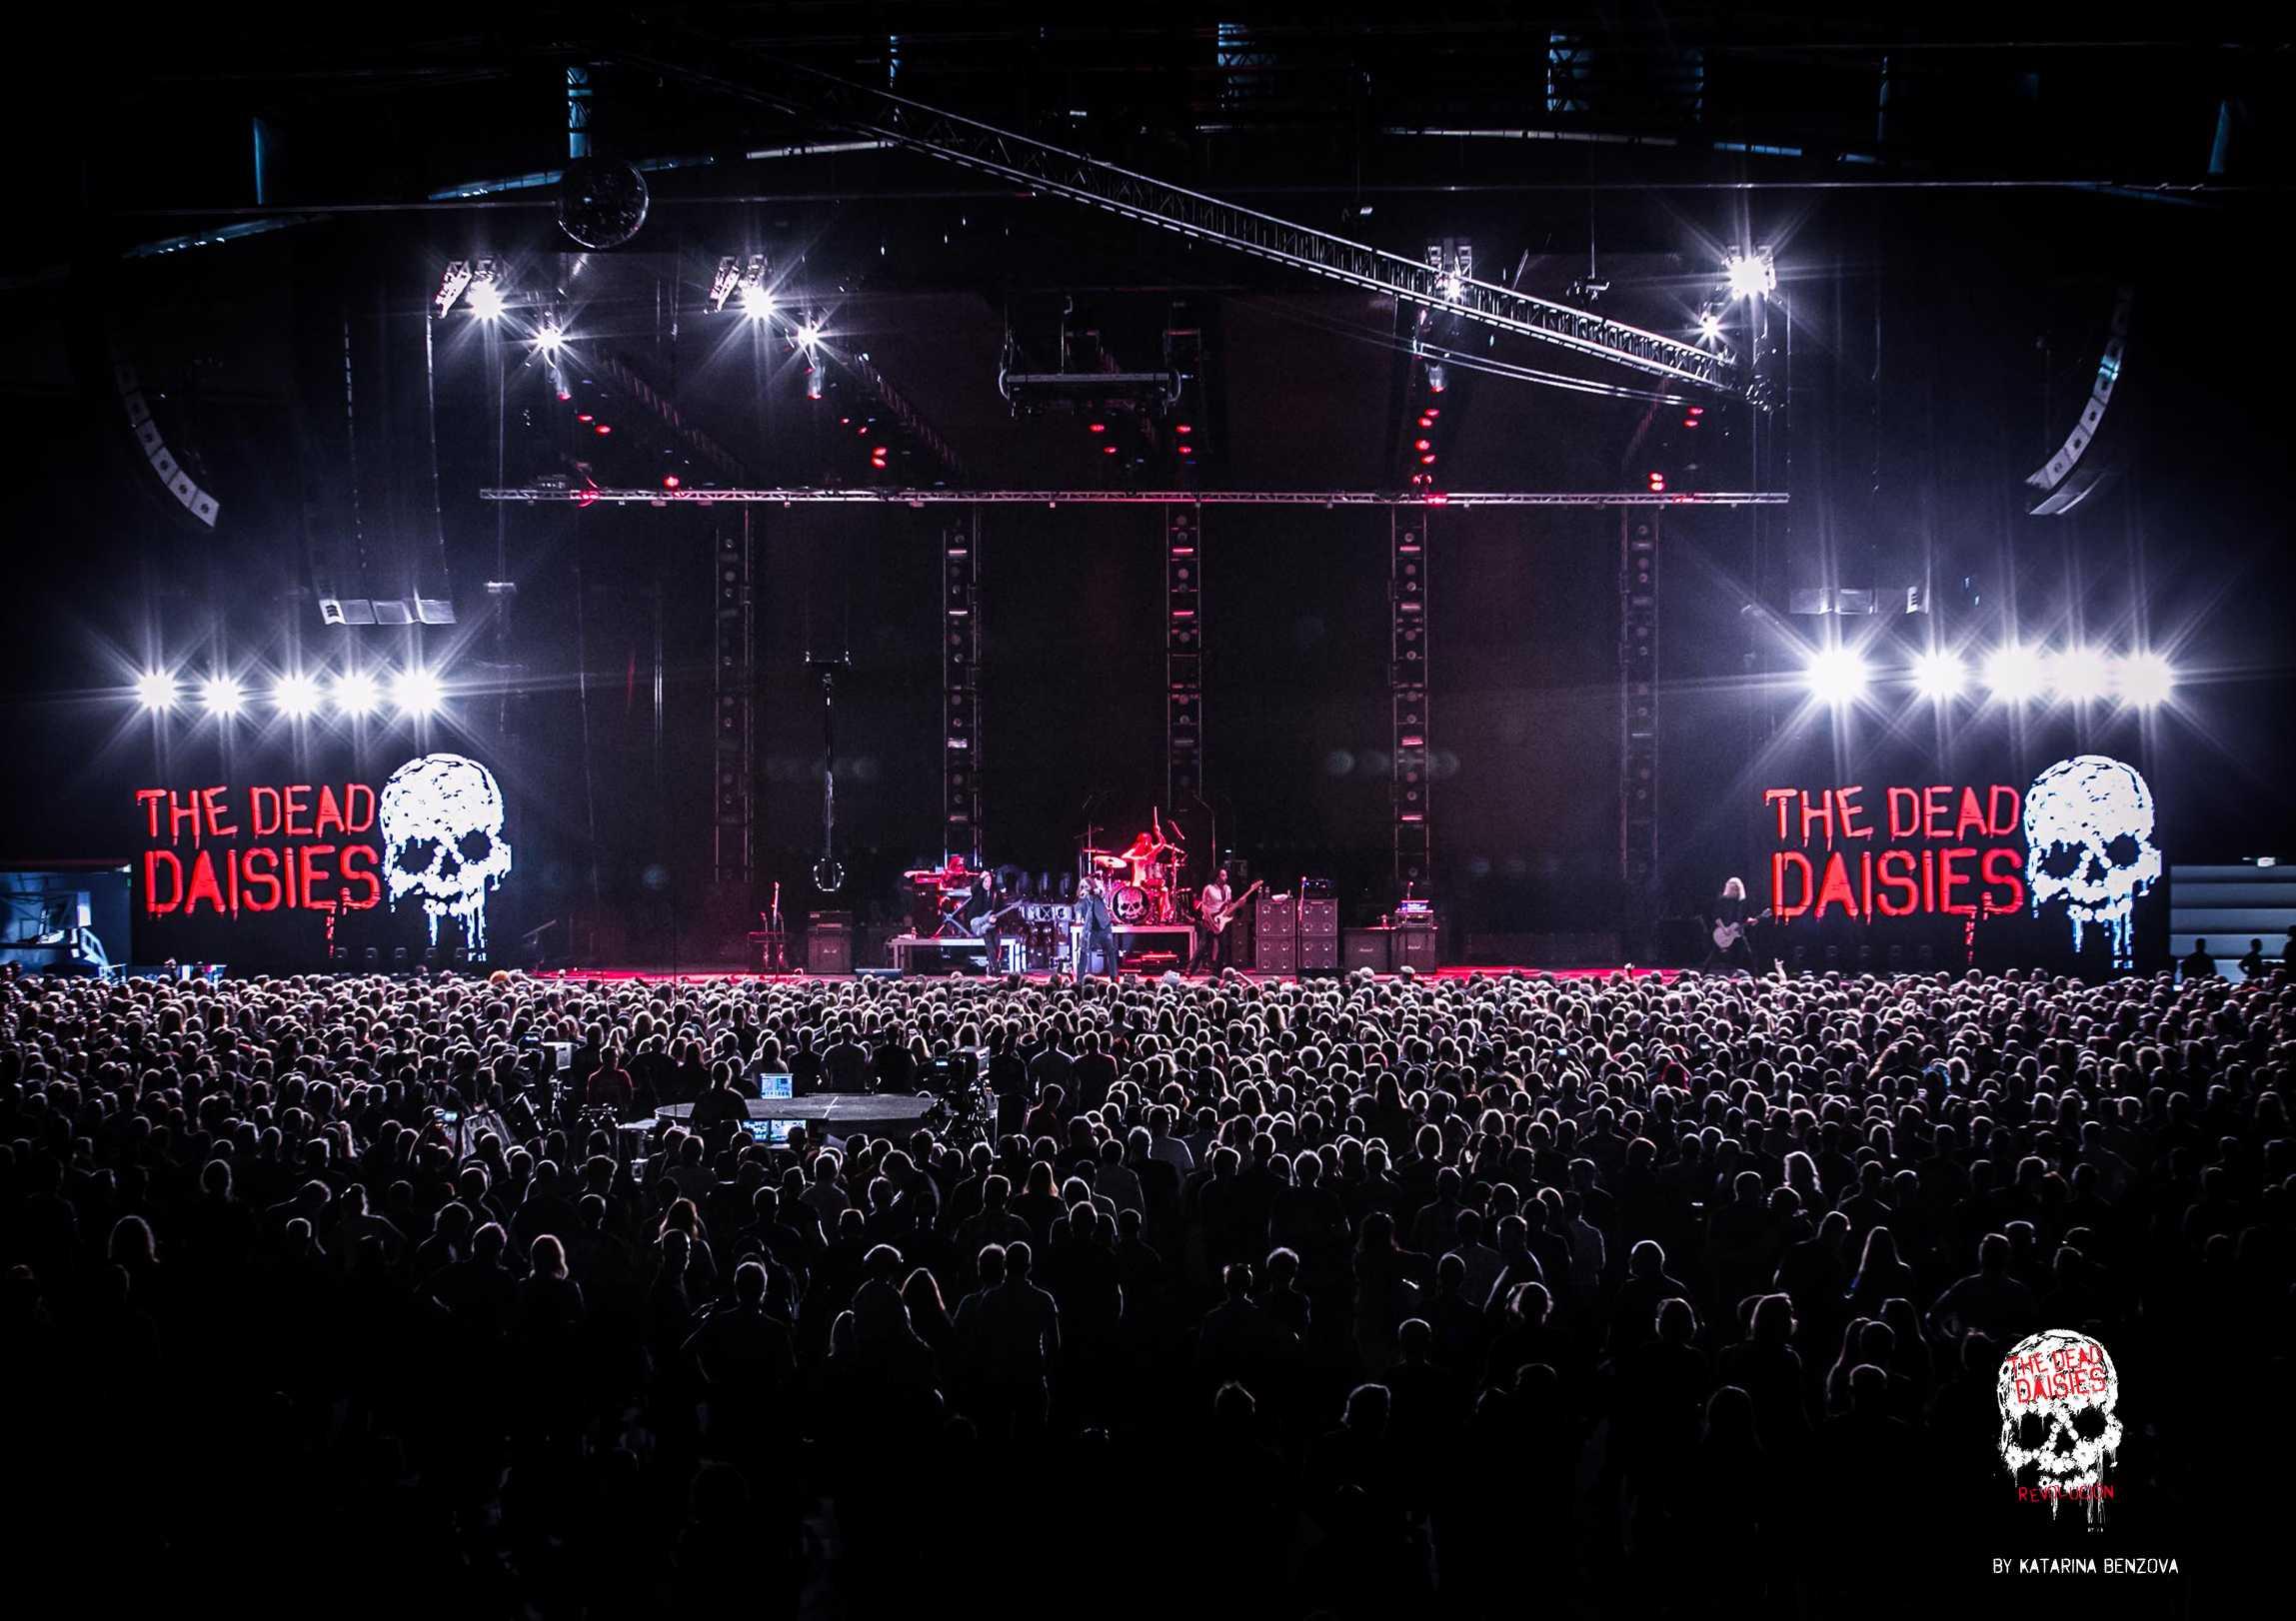 Day 7, Leipzig, Germany